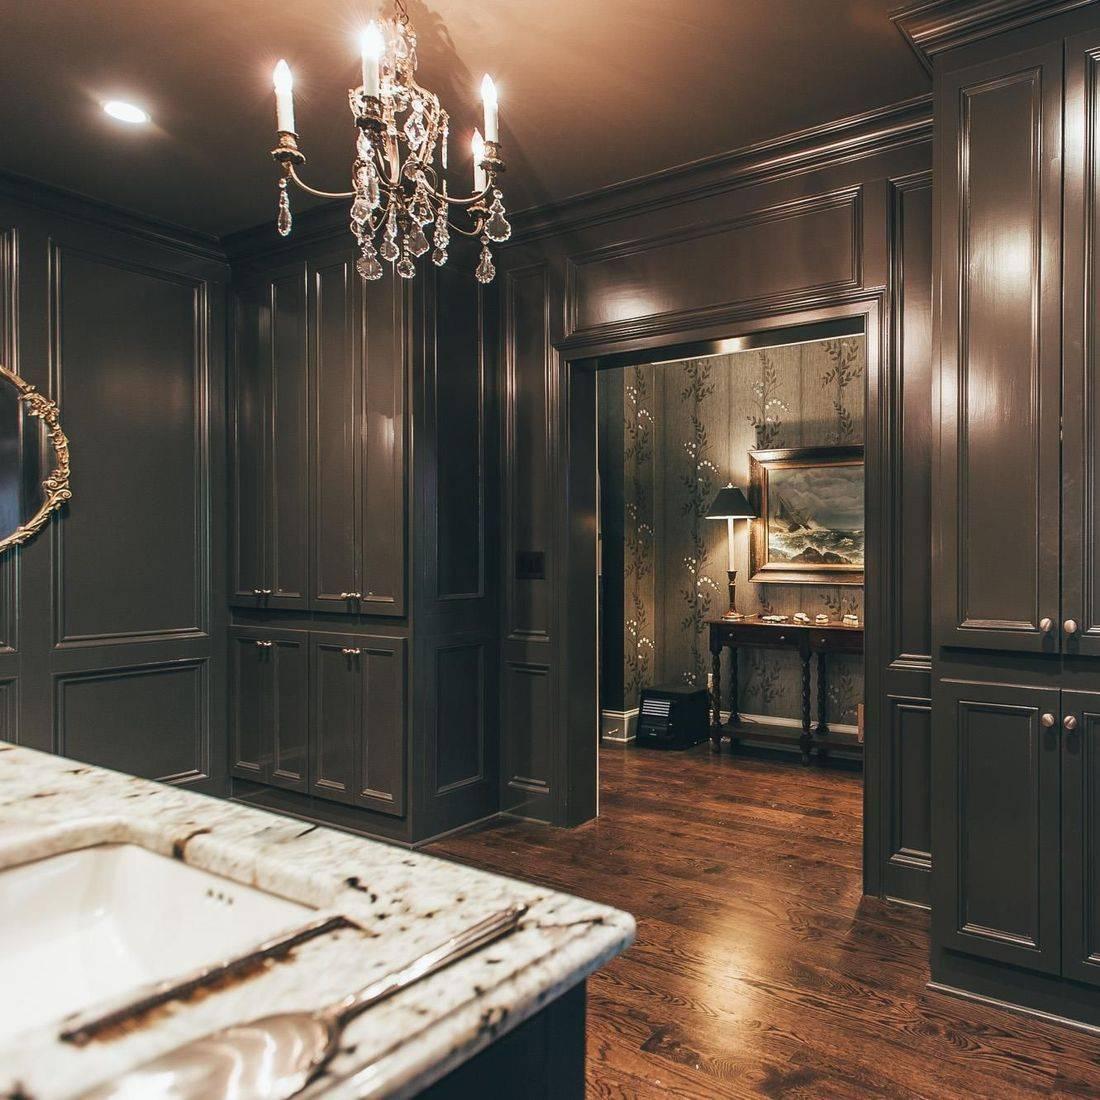 Photo of brown cabinets built around a doorway